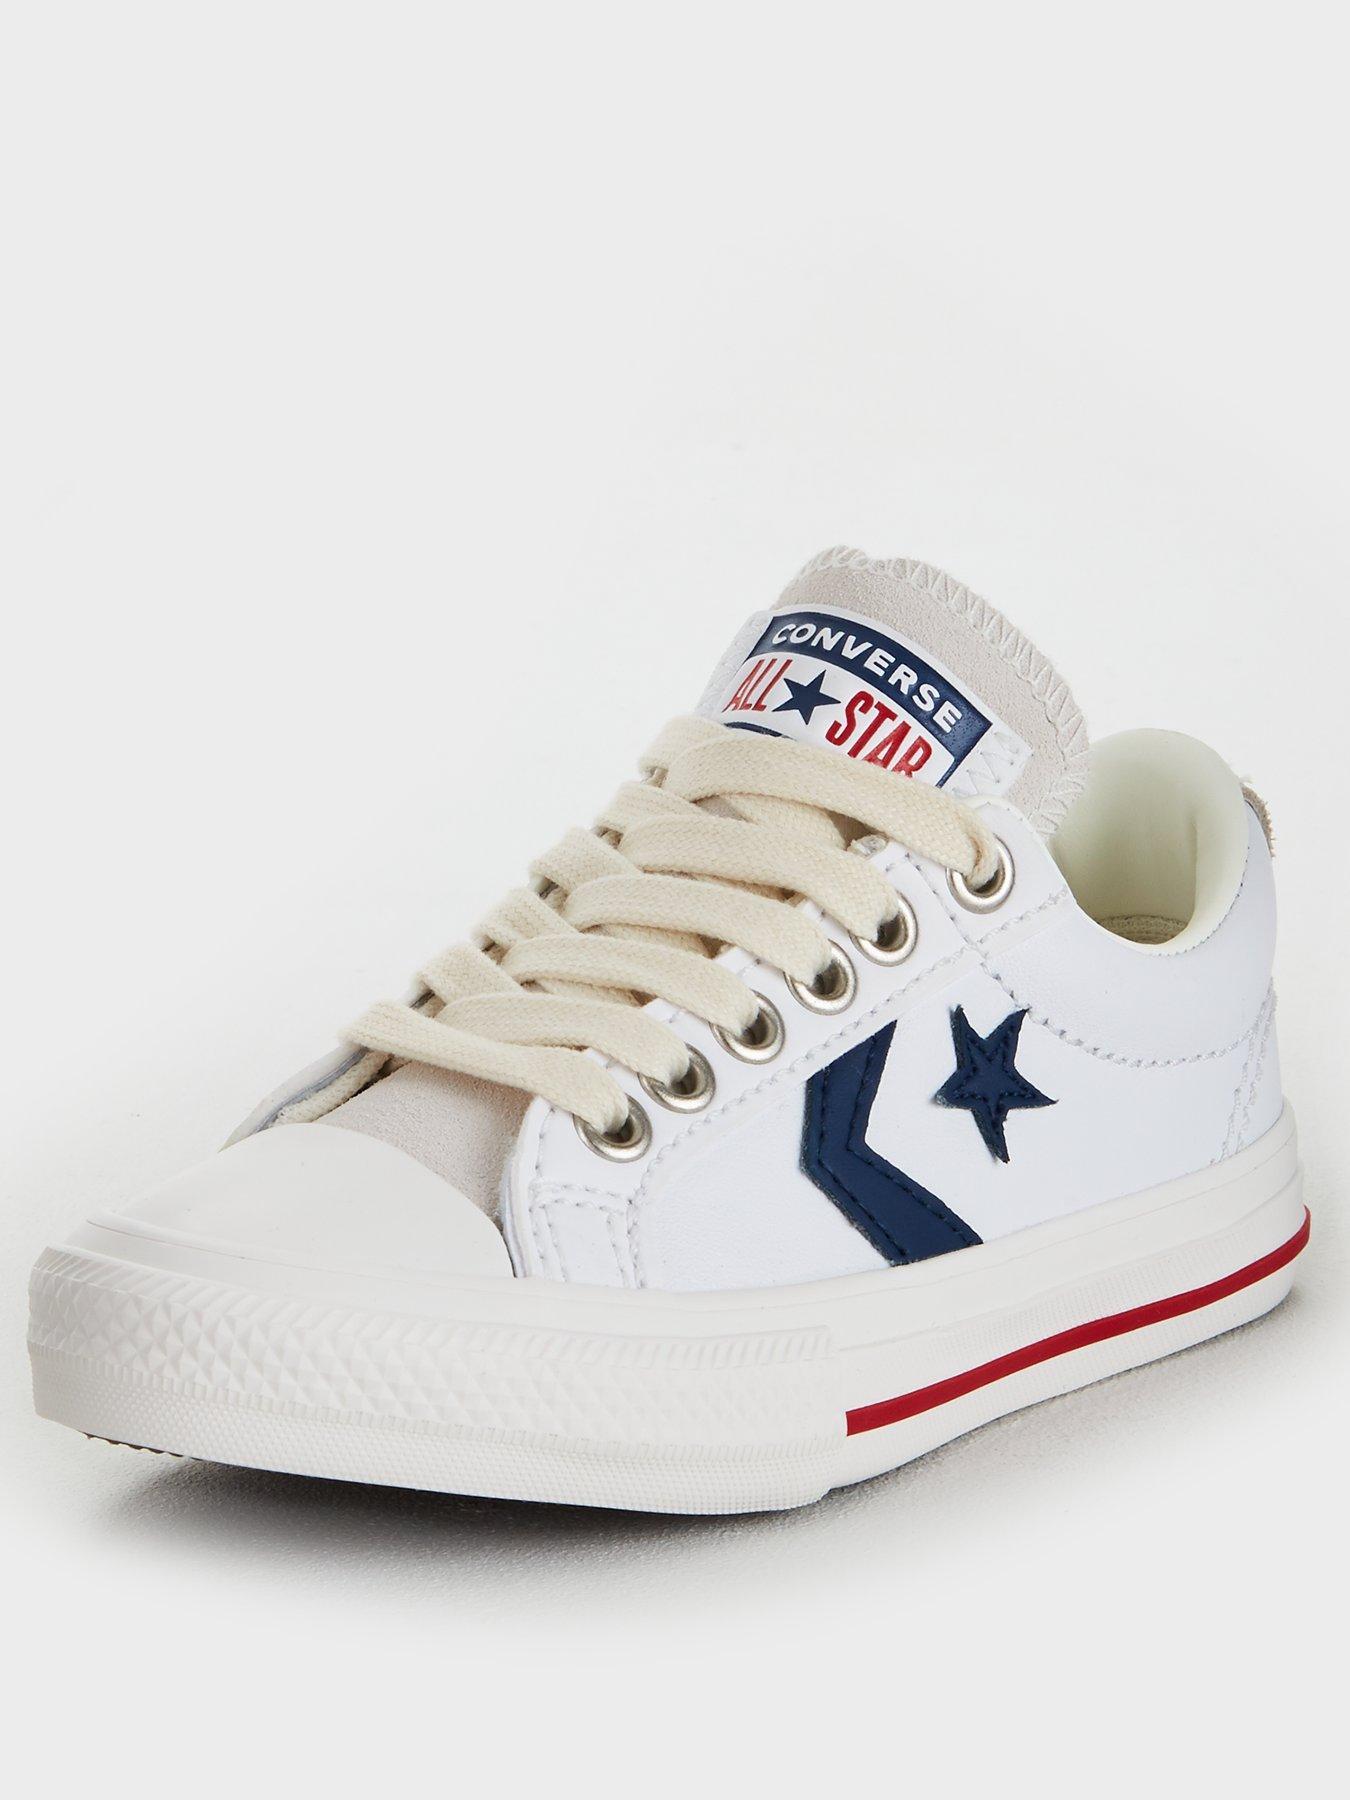 converse star player ev ox Shop Clothing & Shoes Online